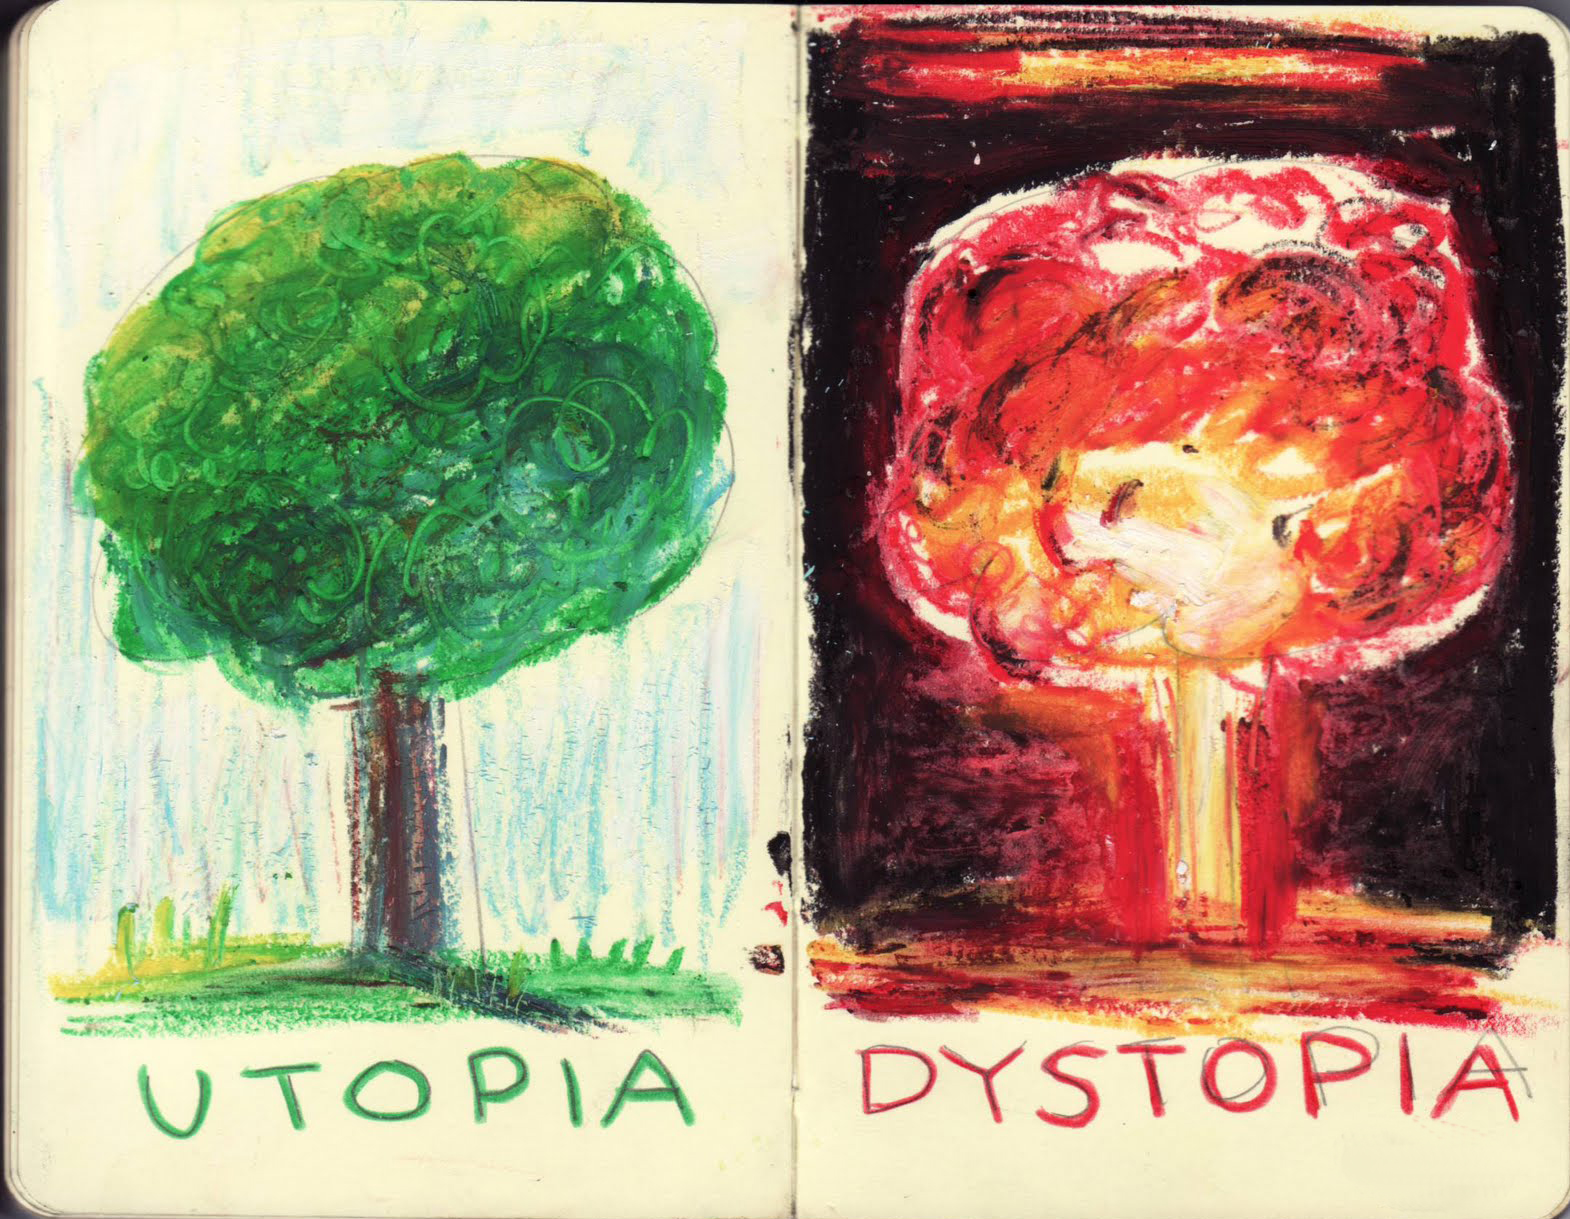 dystopia novel4.jpg